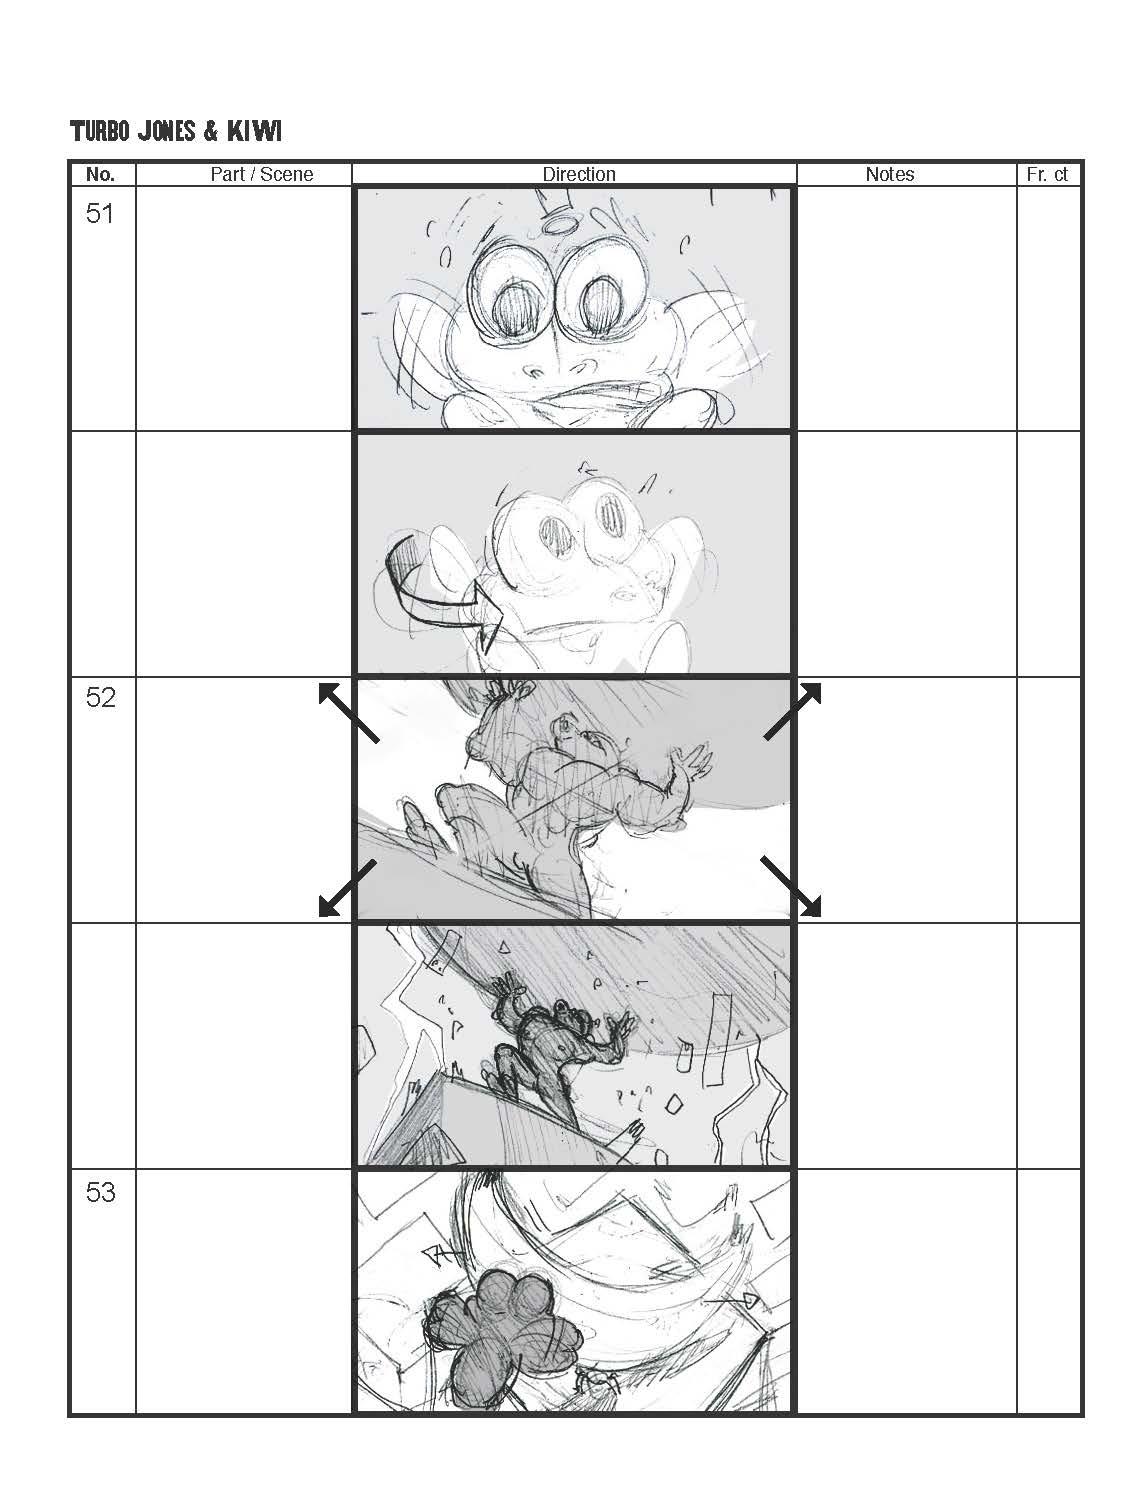 TJK_Storyboards_v01_HIGH_Page_27.jpg